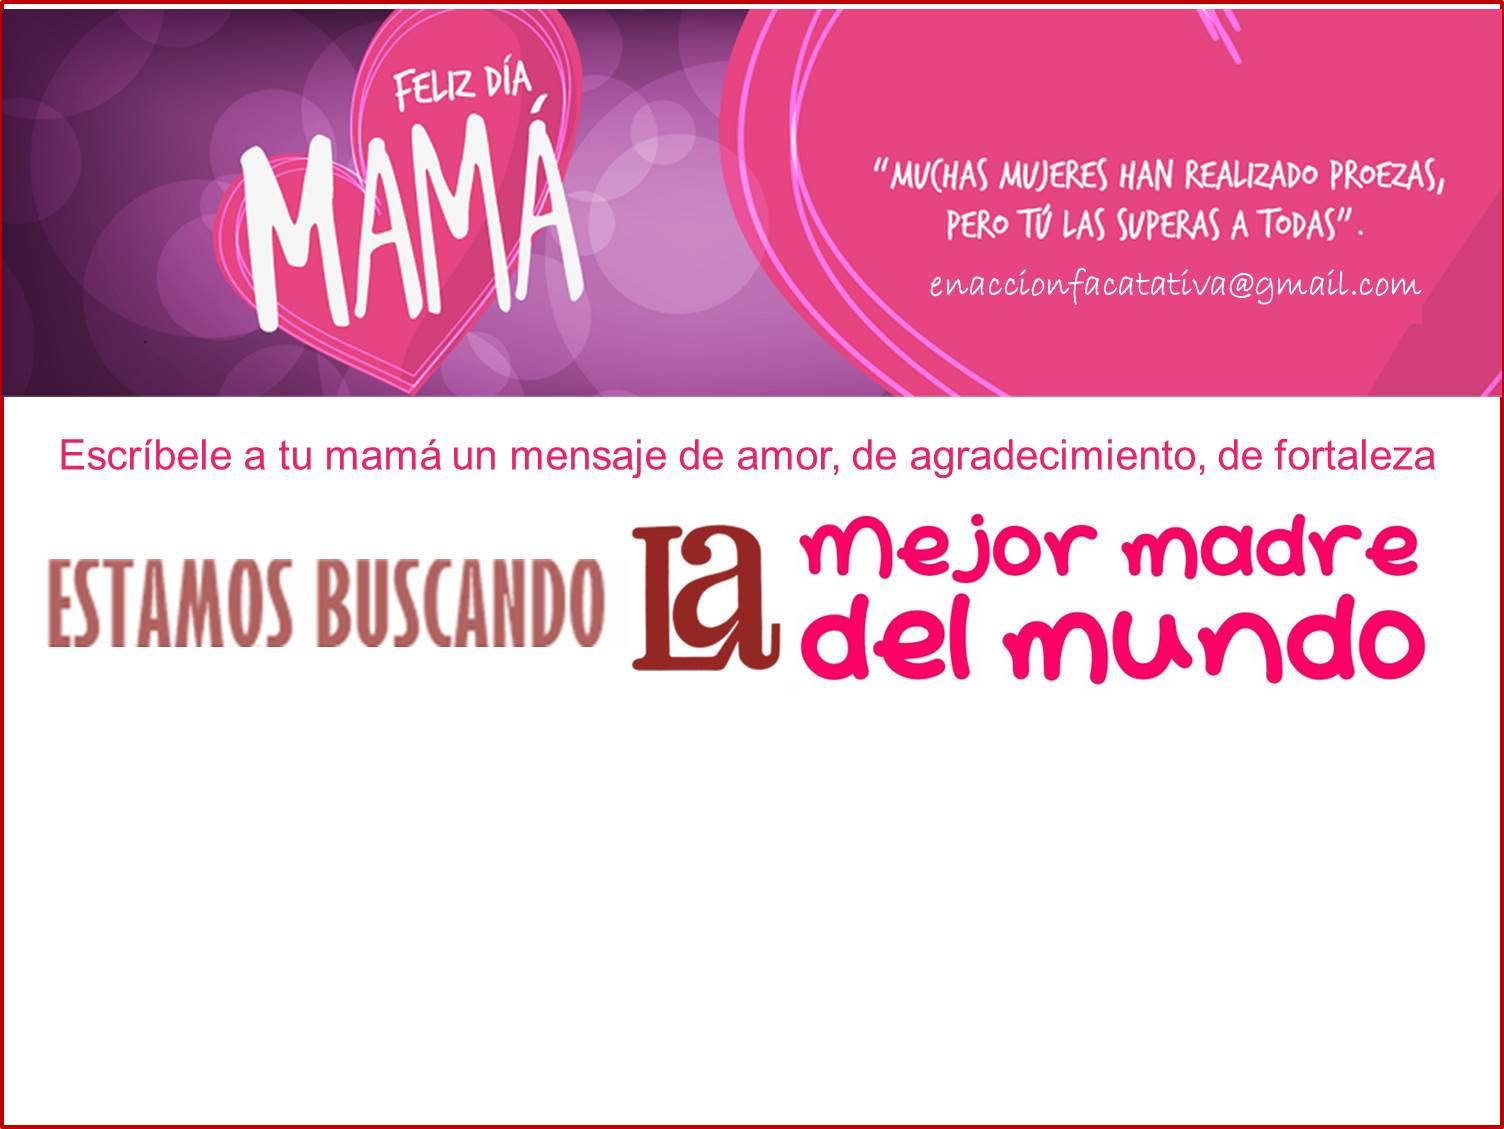 Felicidades mamitas